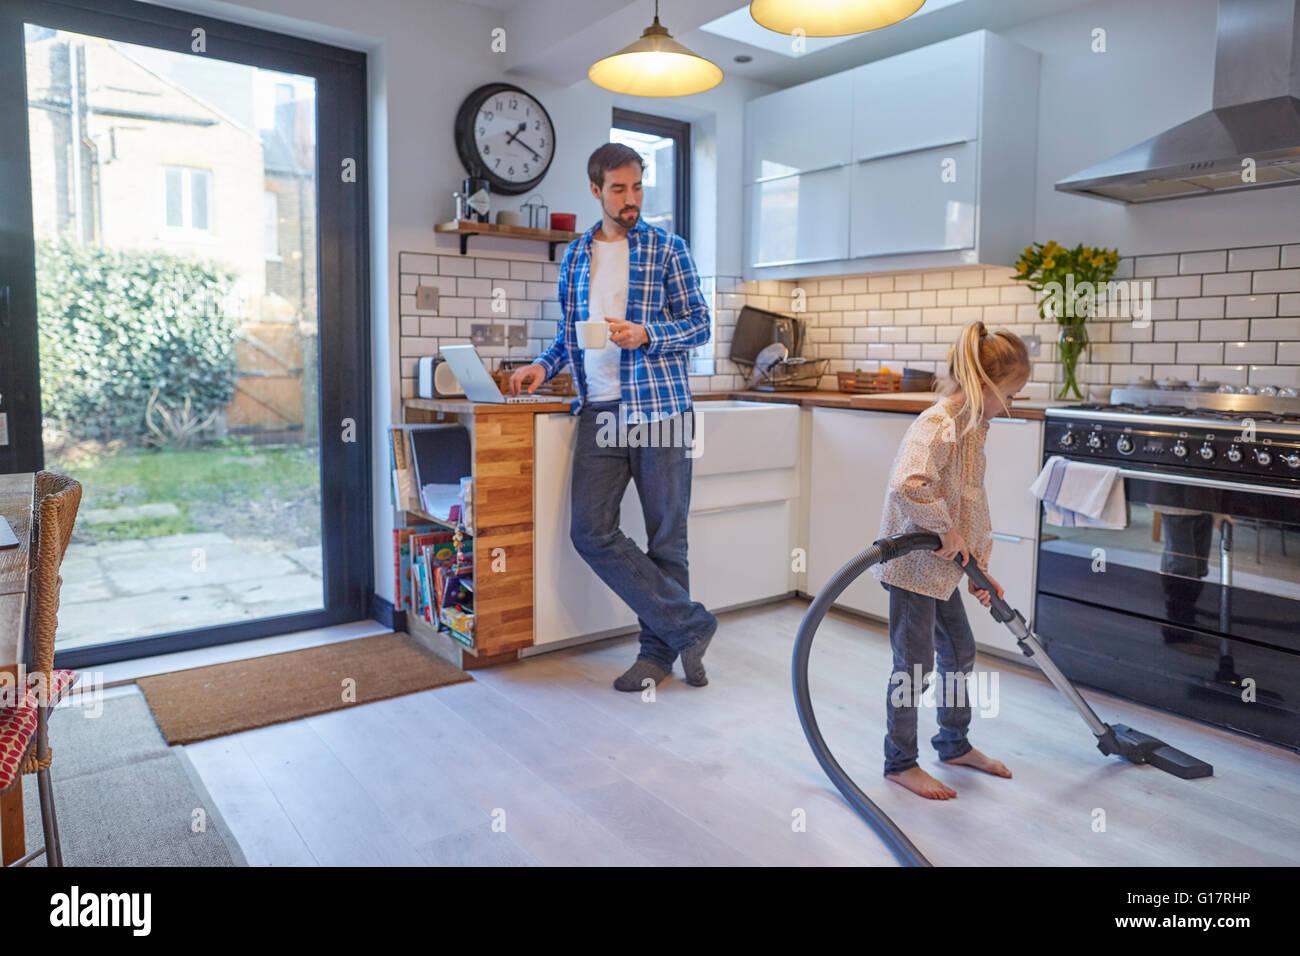 Attrayant Father Watching Daughter Vacuum Kitchen Floor